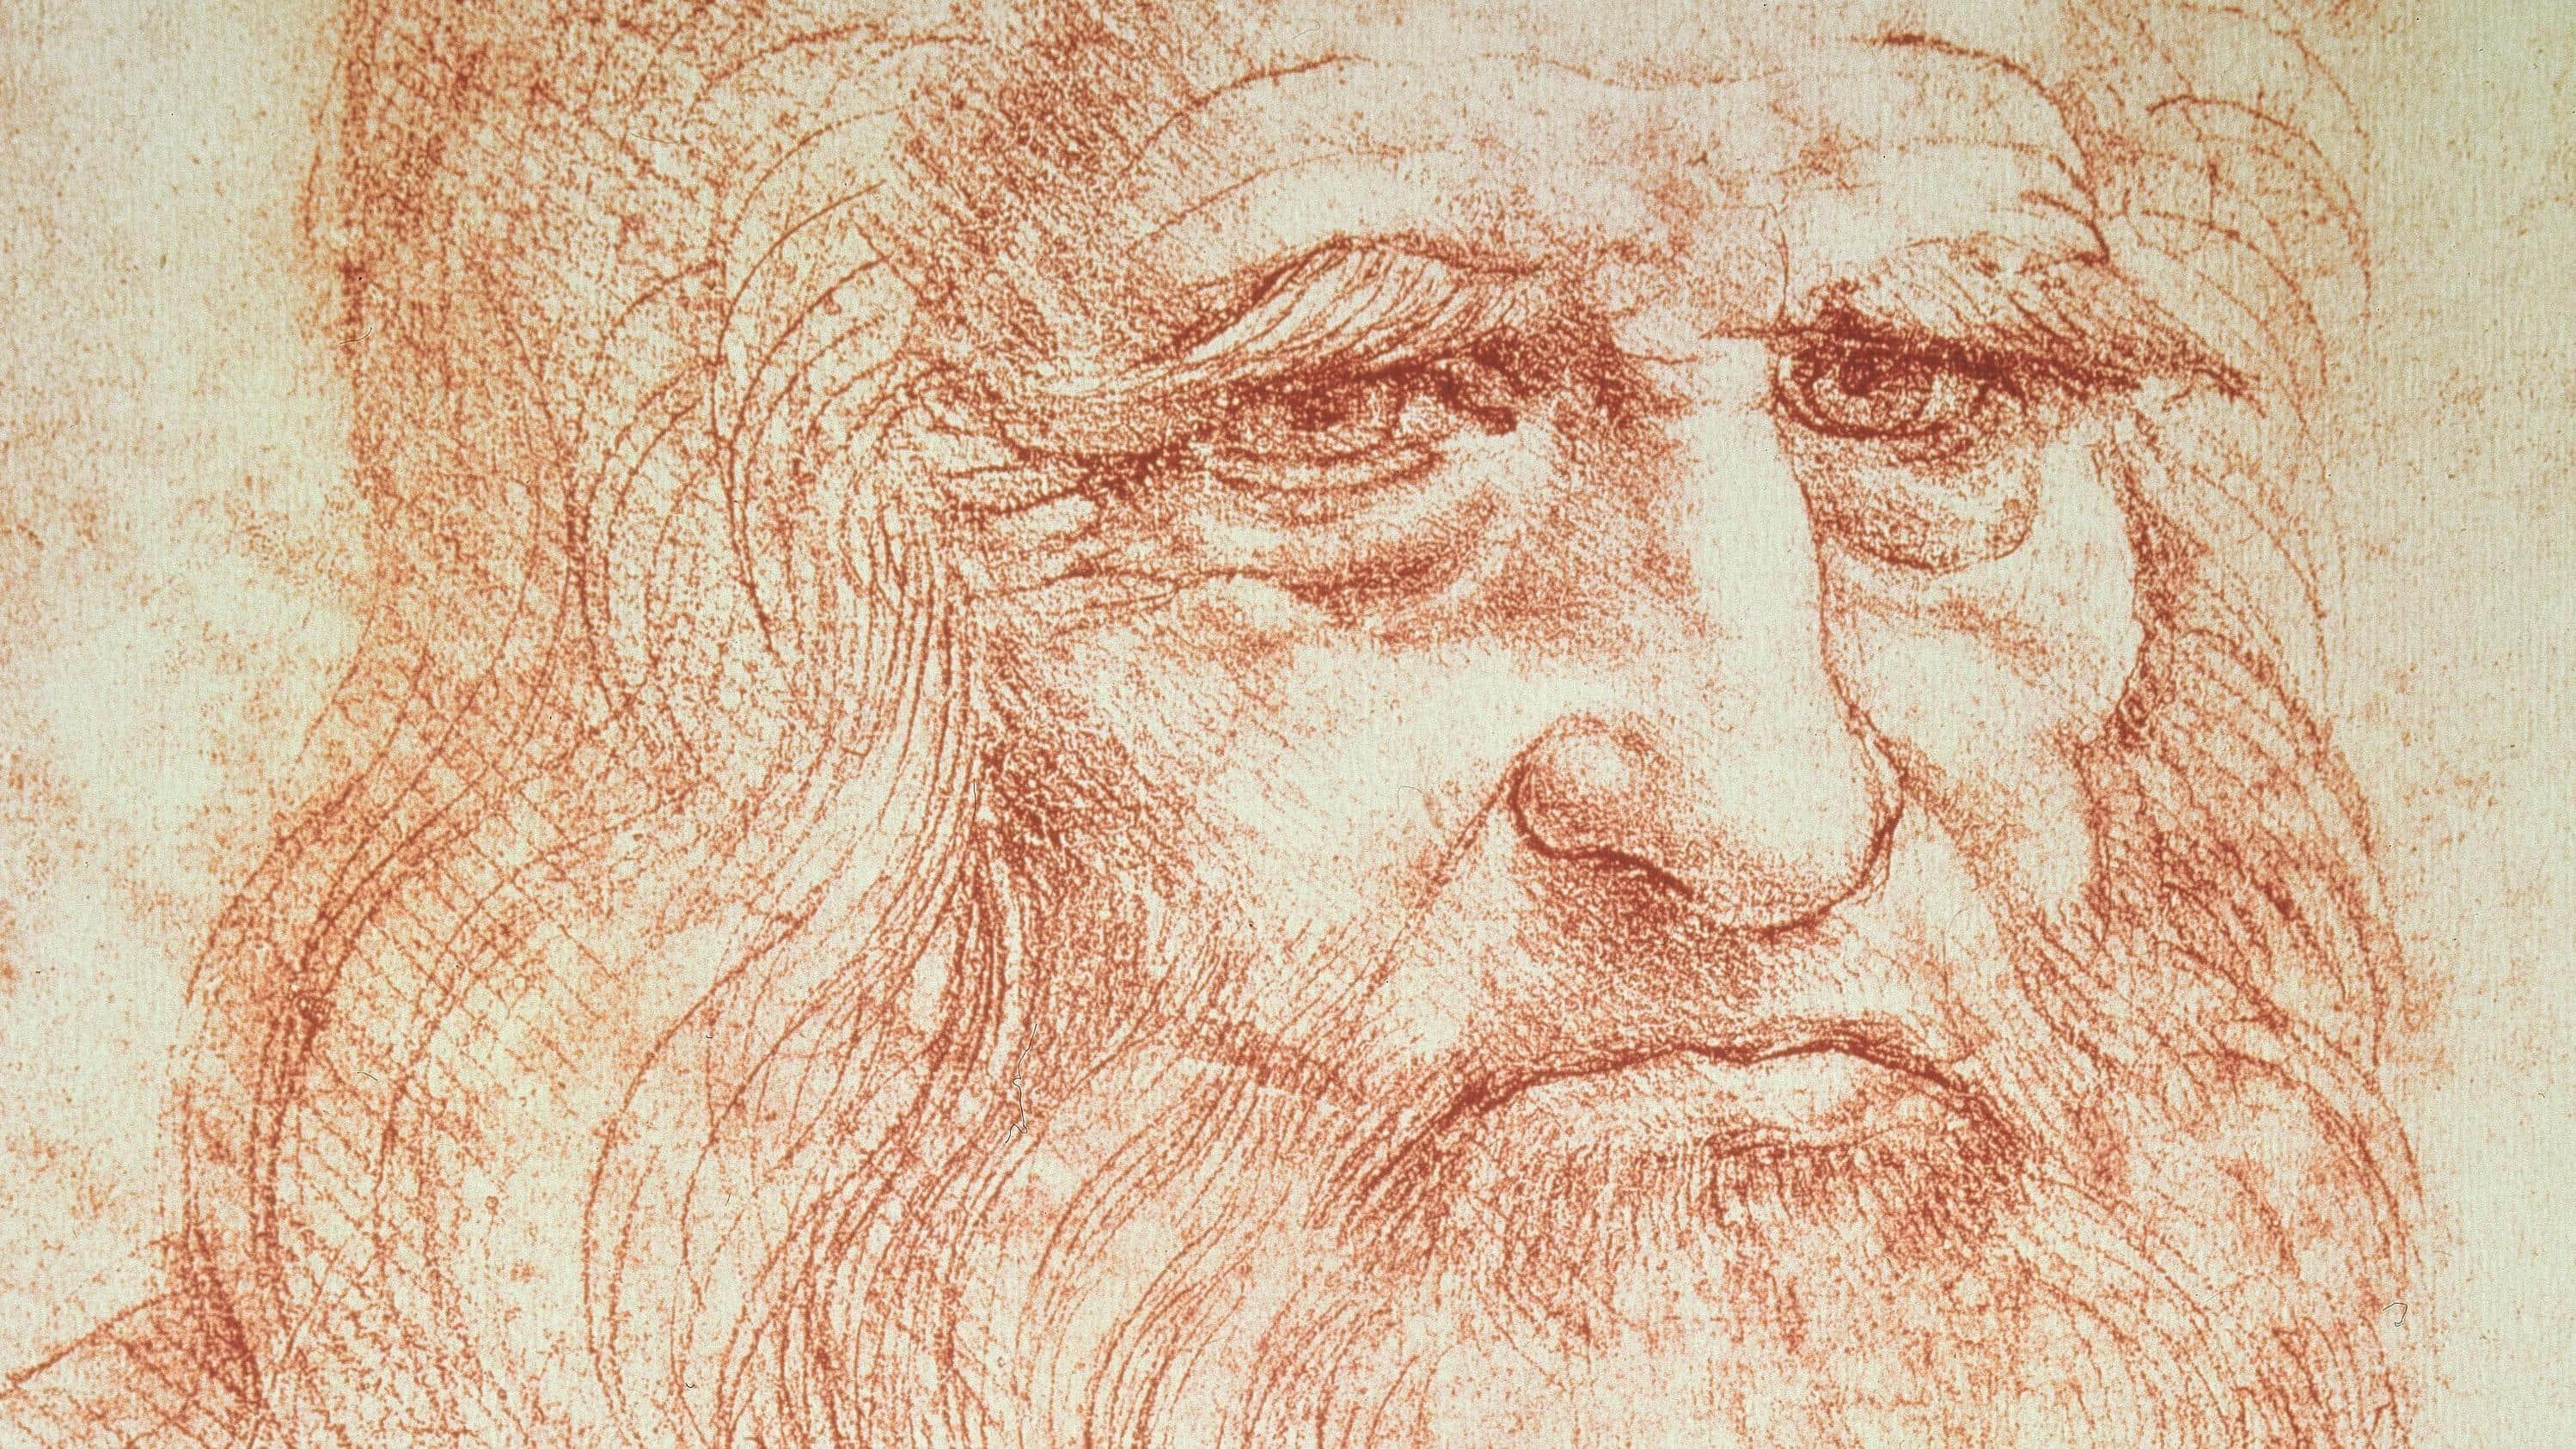 Офтальмолог нашел у Леонардо да Винчи косоглазие